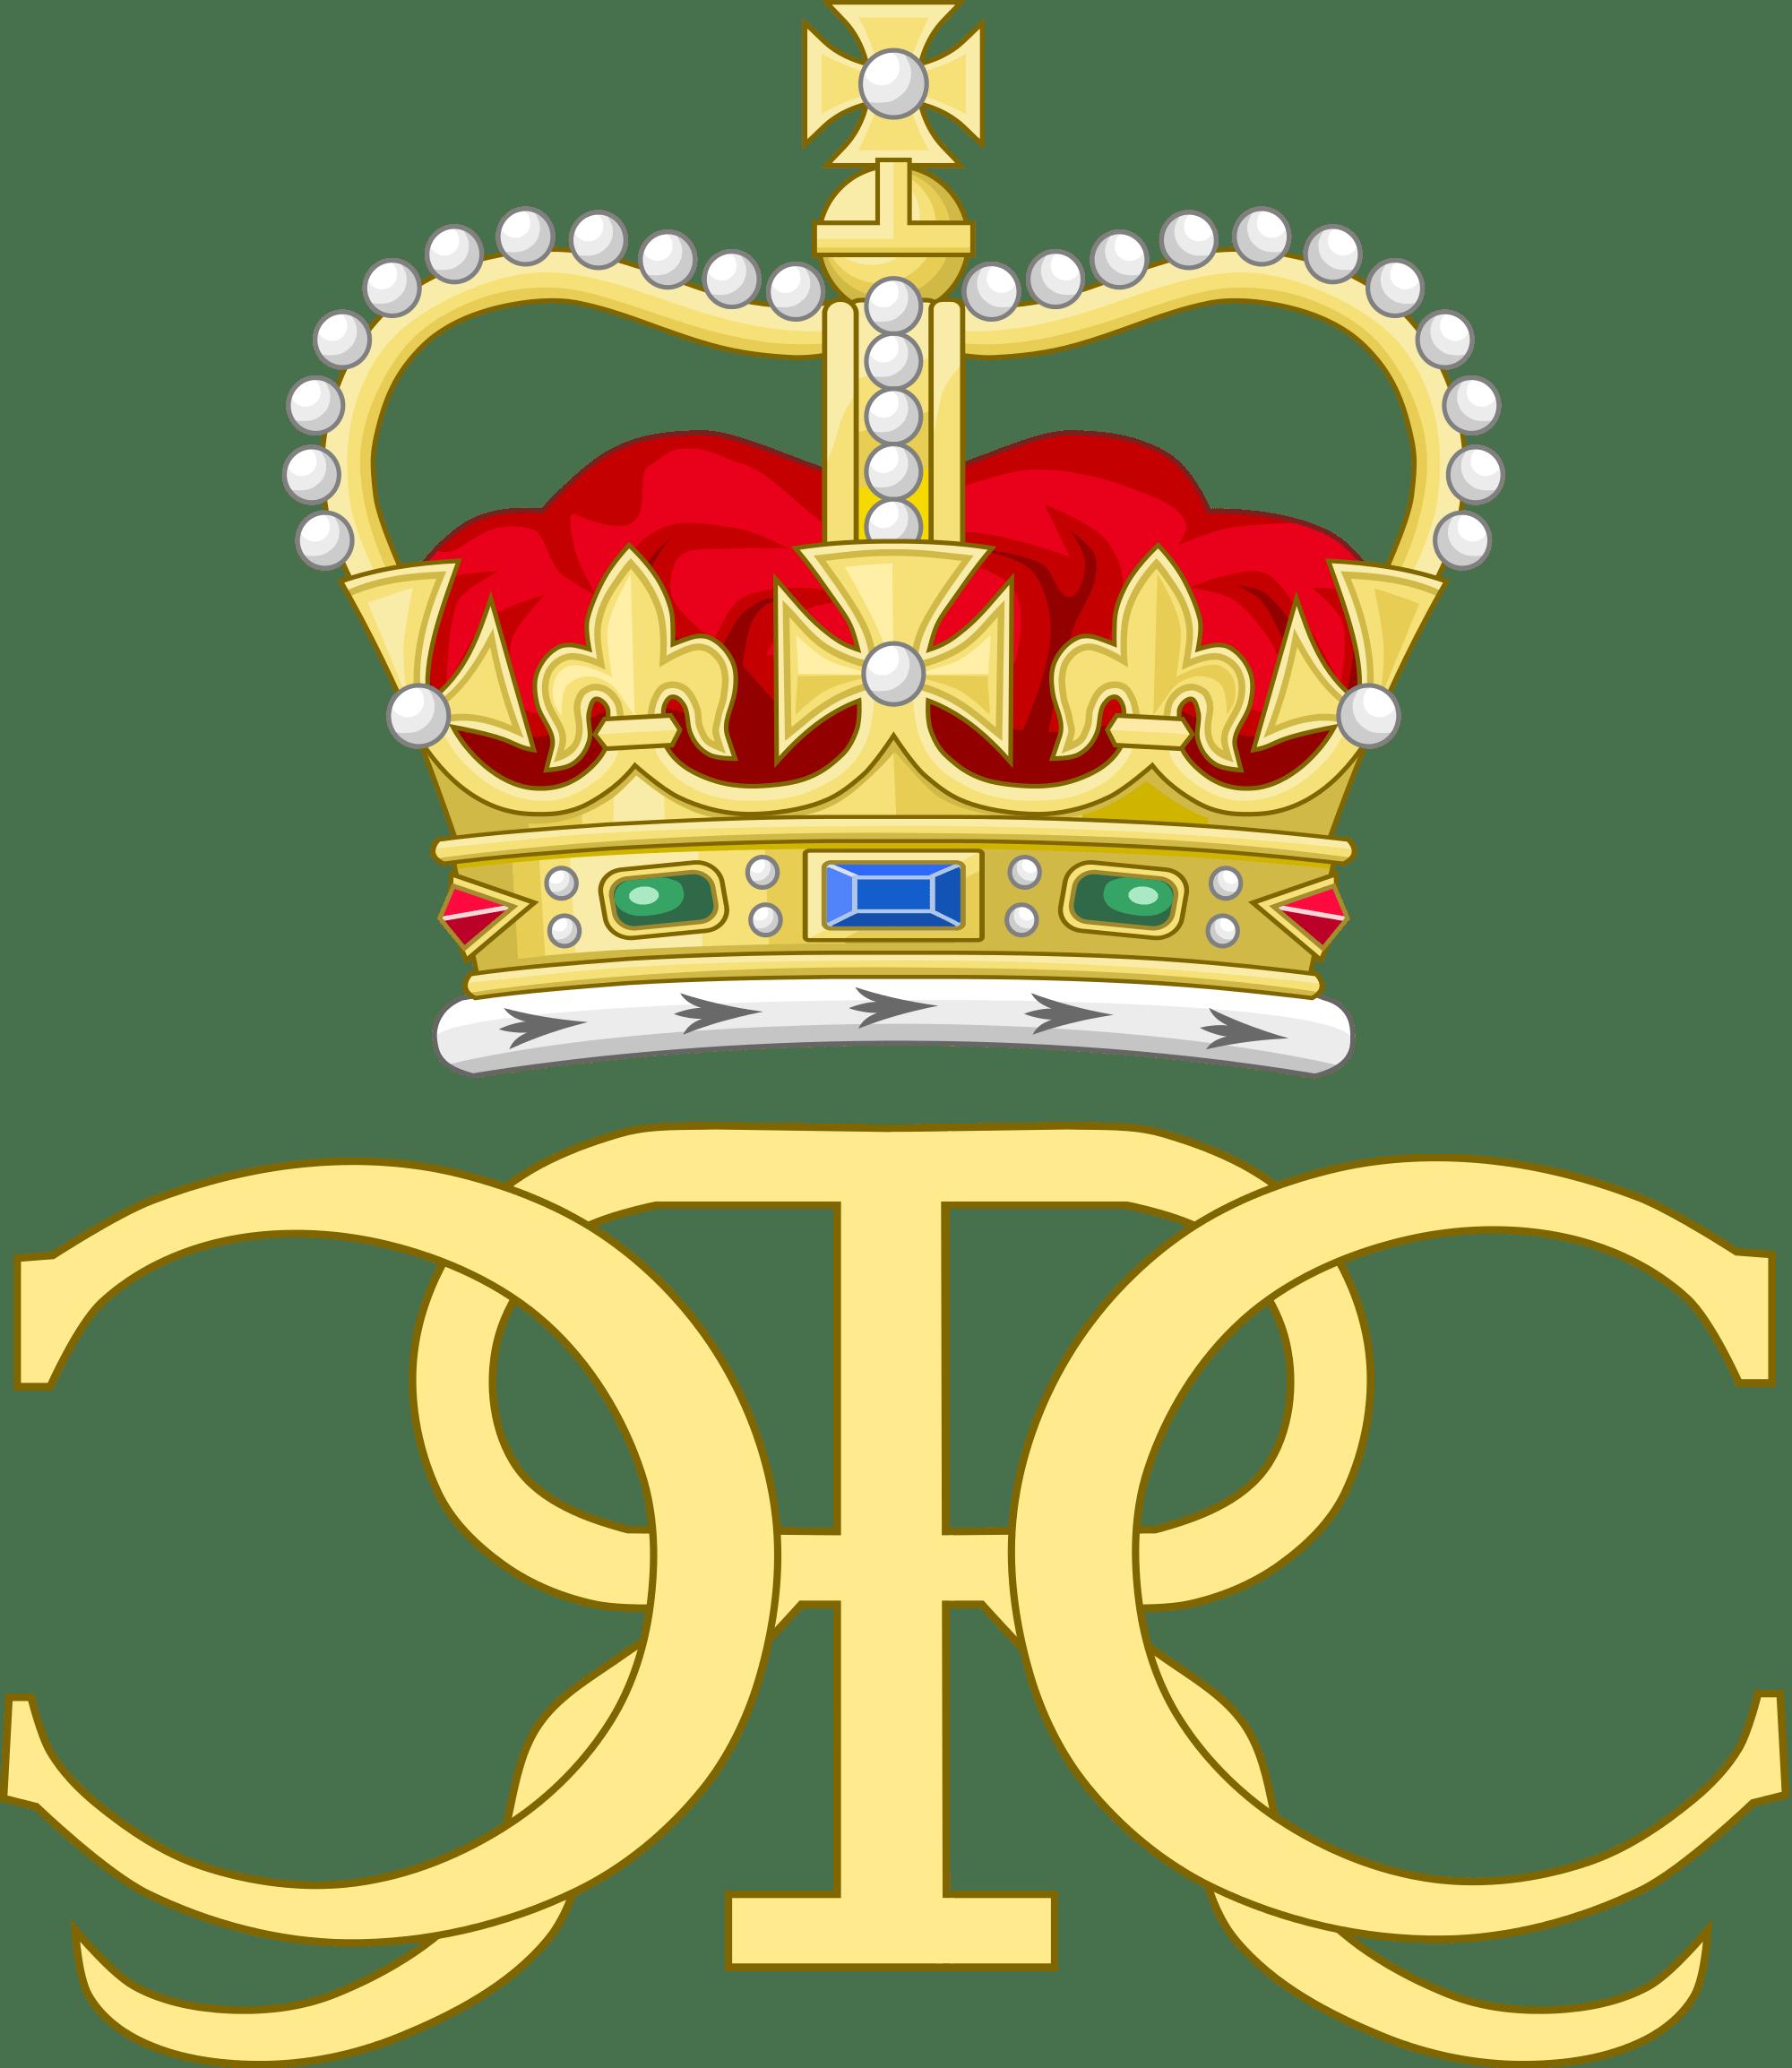 Charles ii monogram transparent. King clipart england king